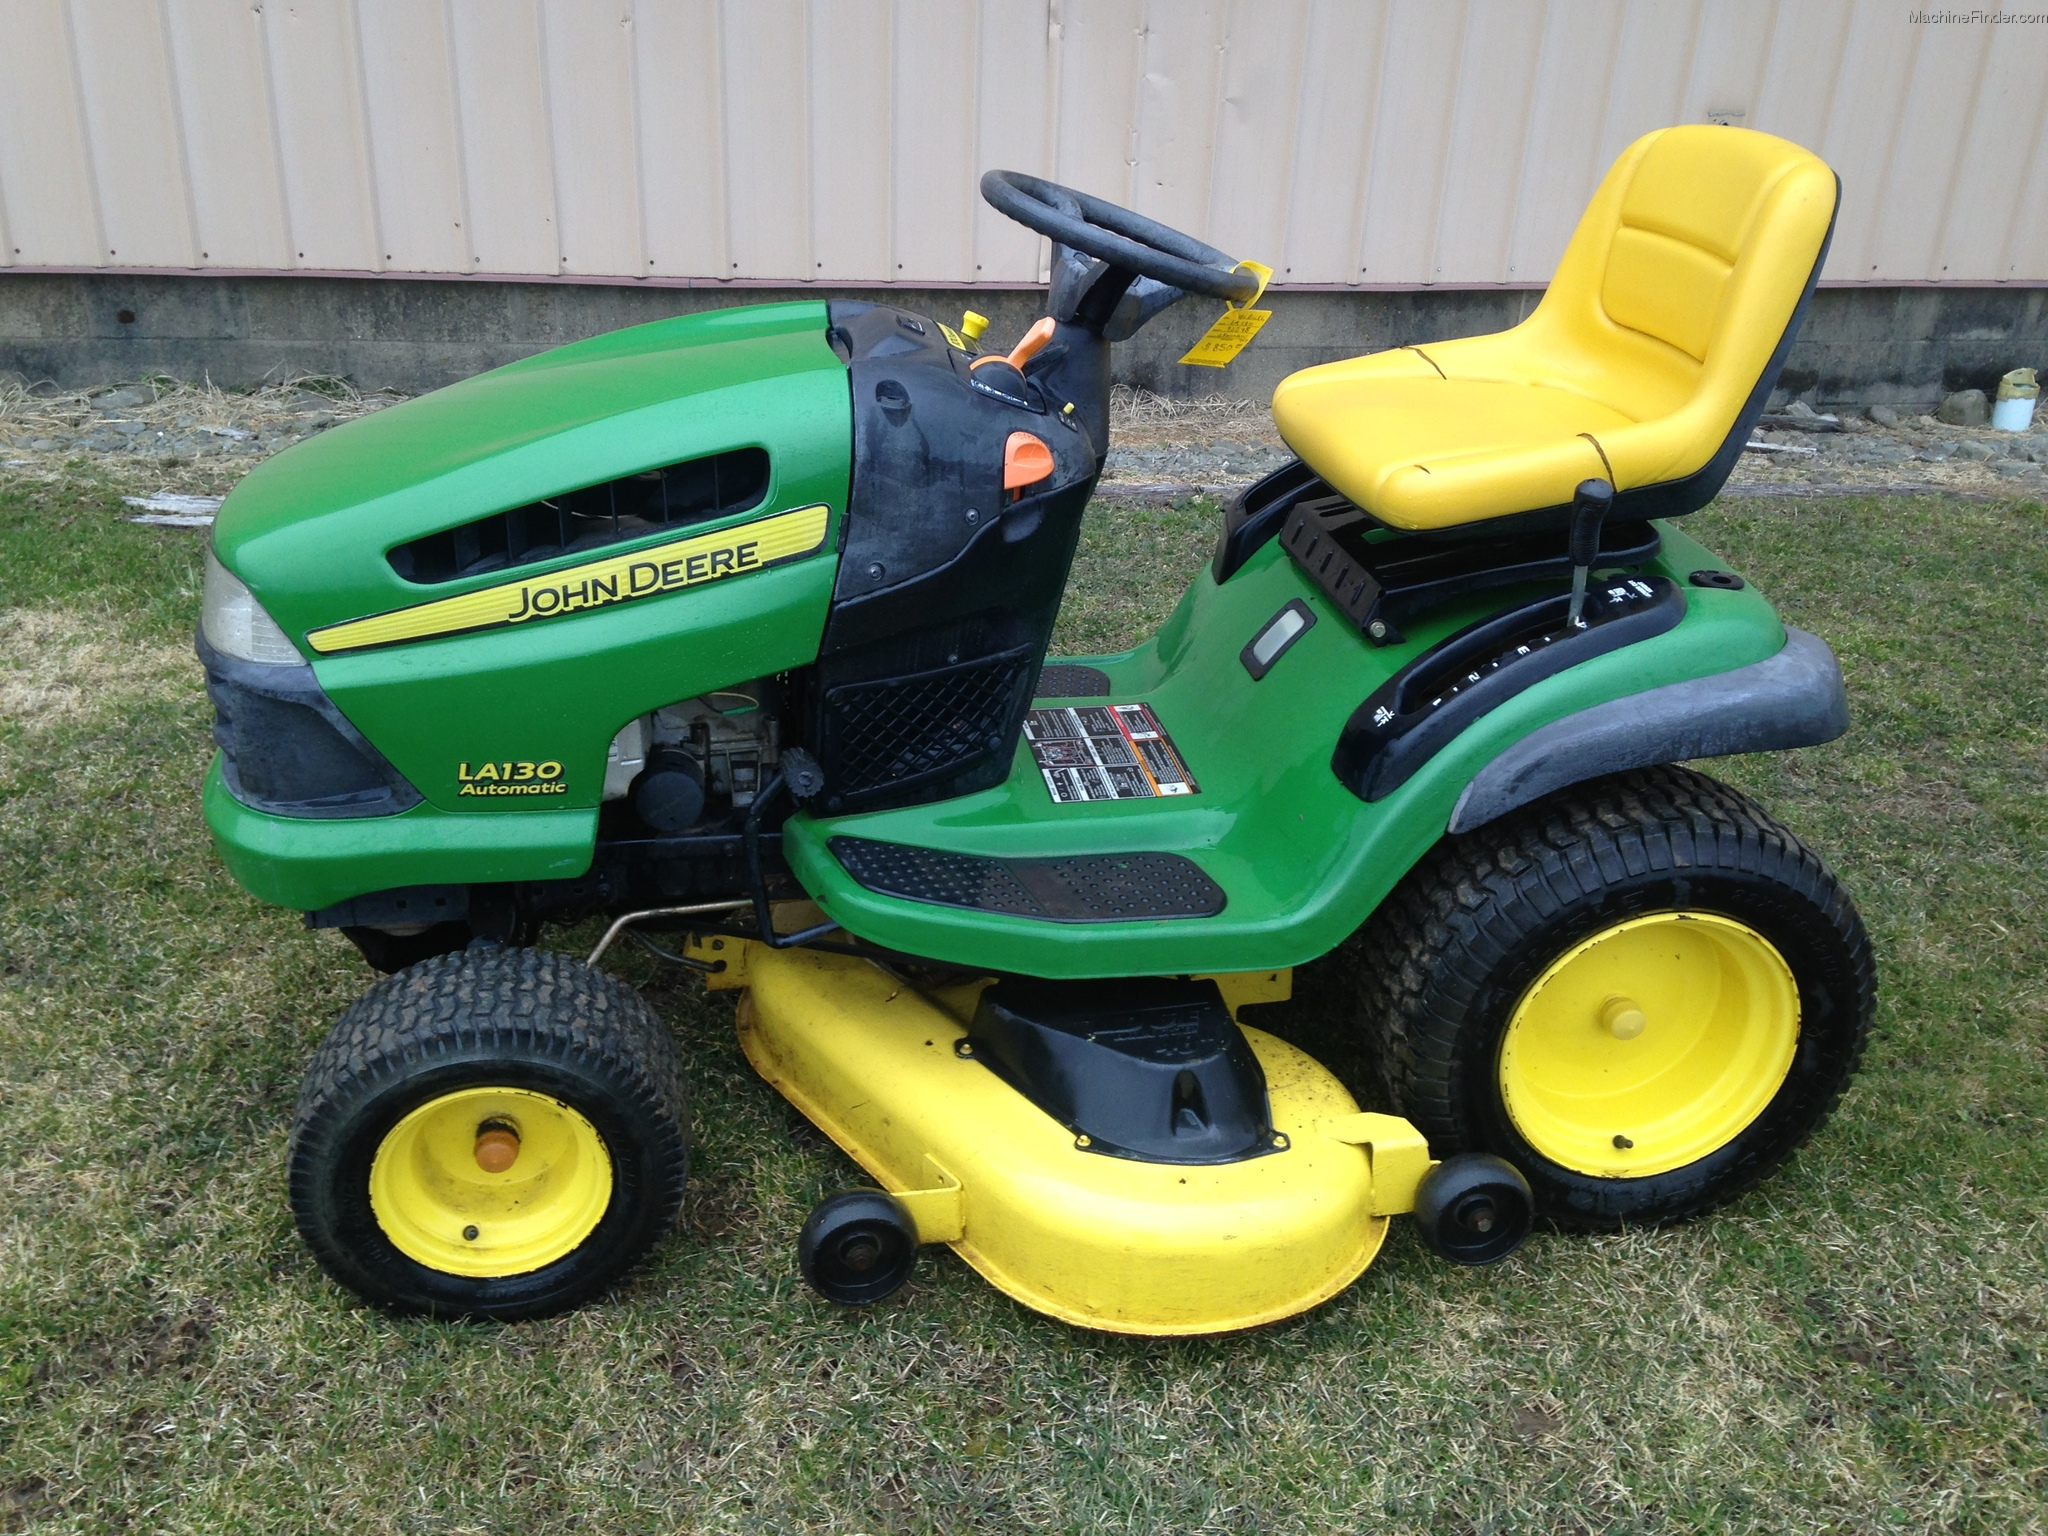 John Deere La120 Lawn Tractor Tractors D130 Belt Diagram Auto Cars Price And Release 2007 La130 Garden Commercial Mowing